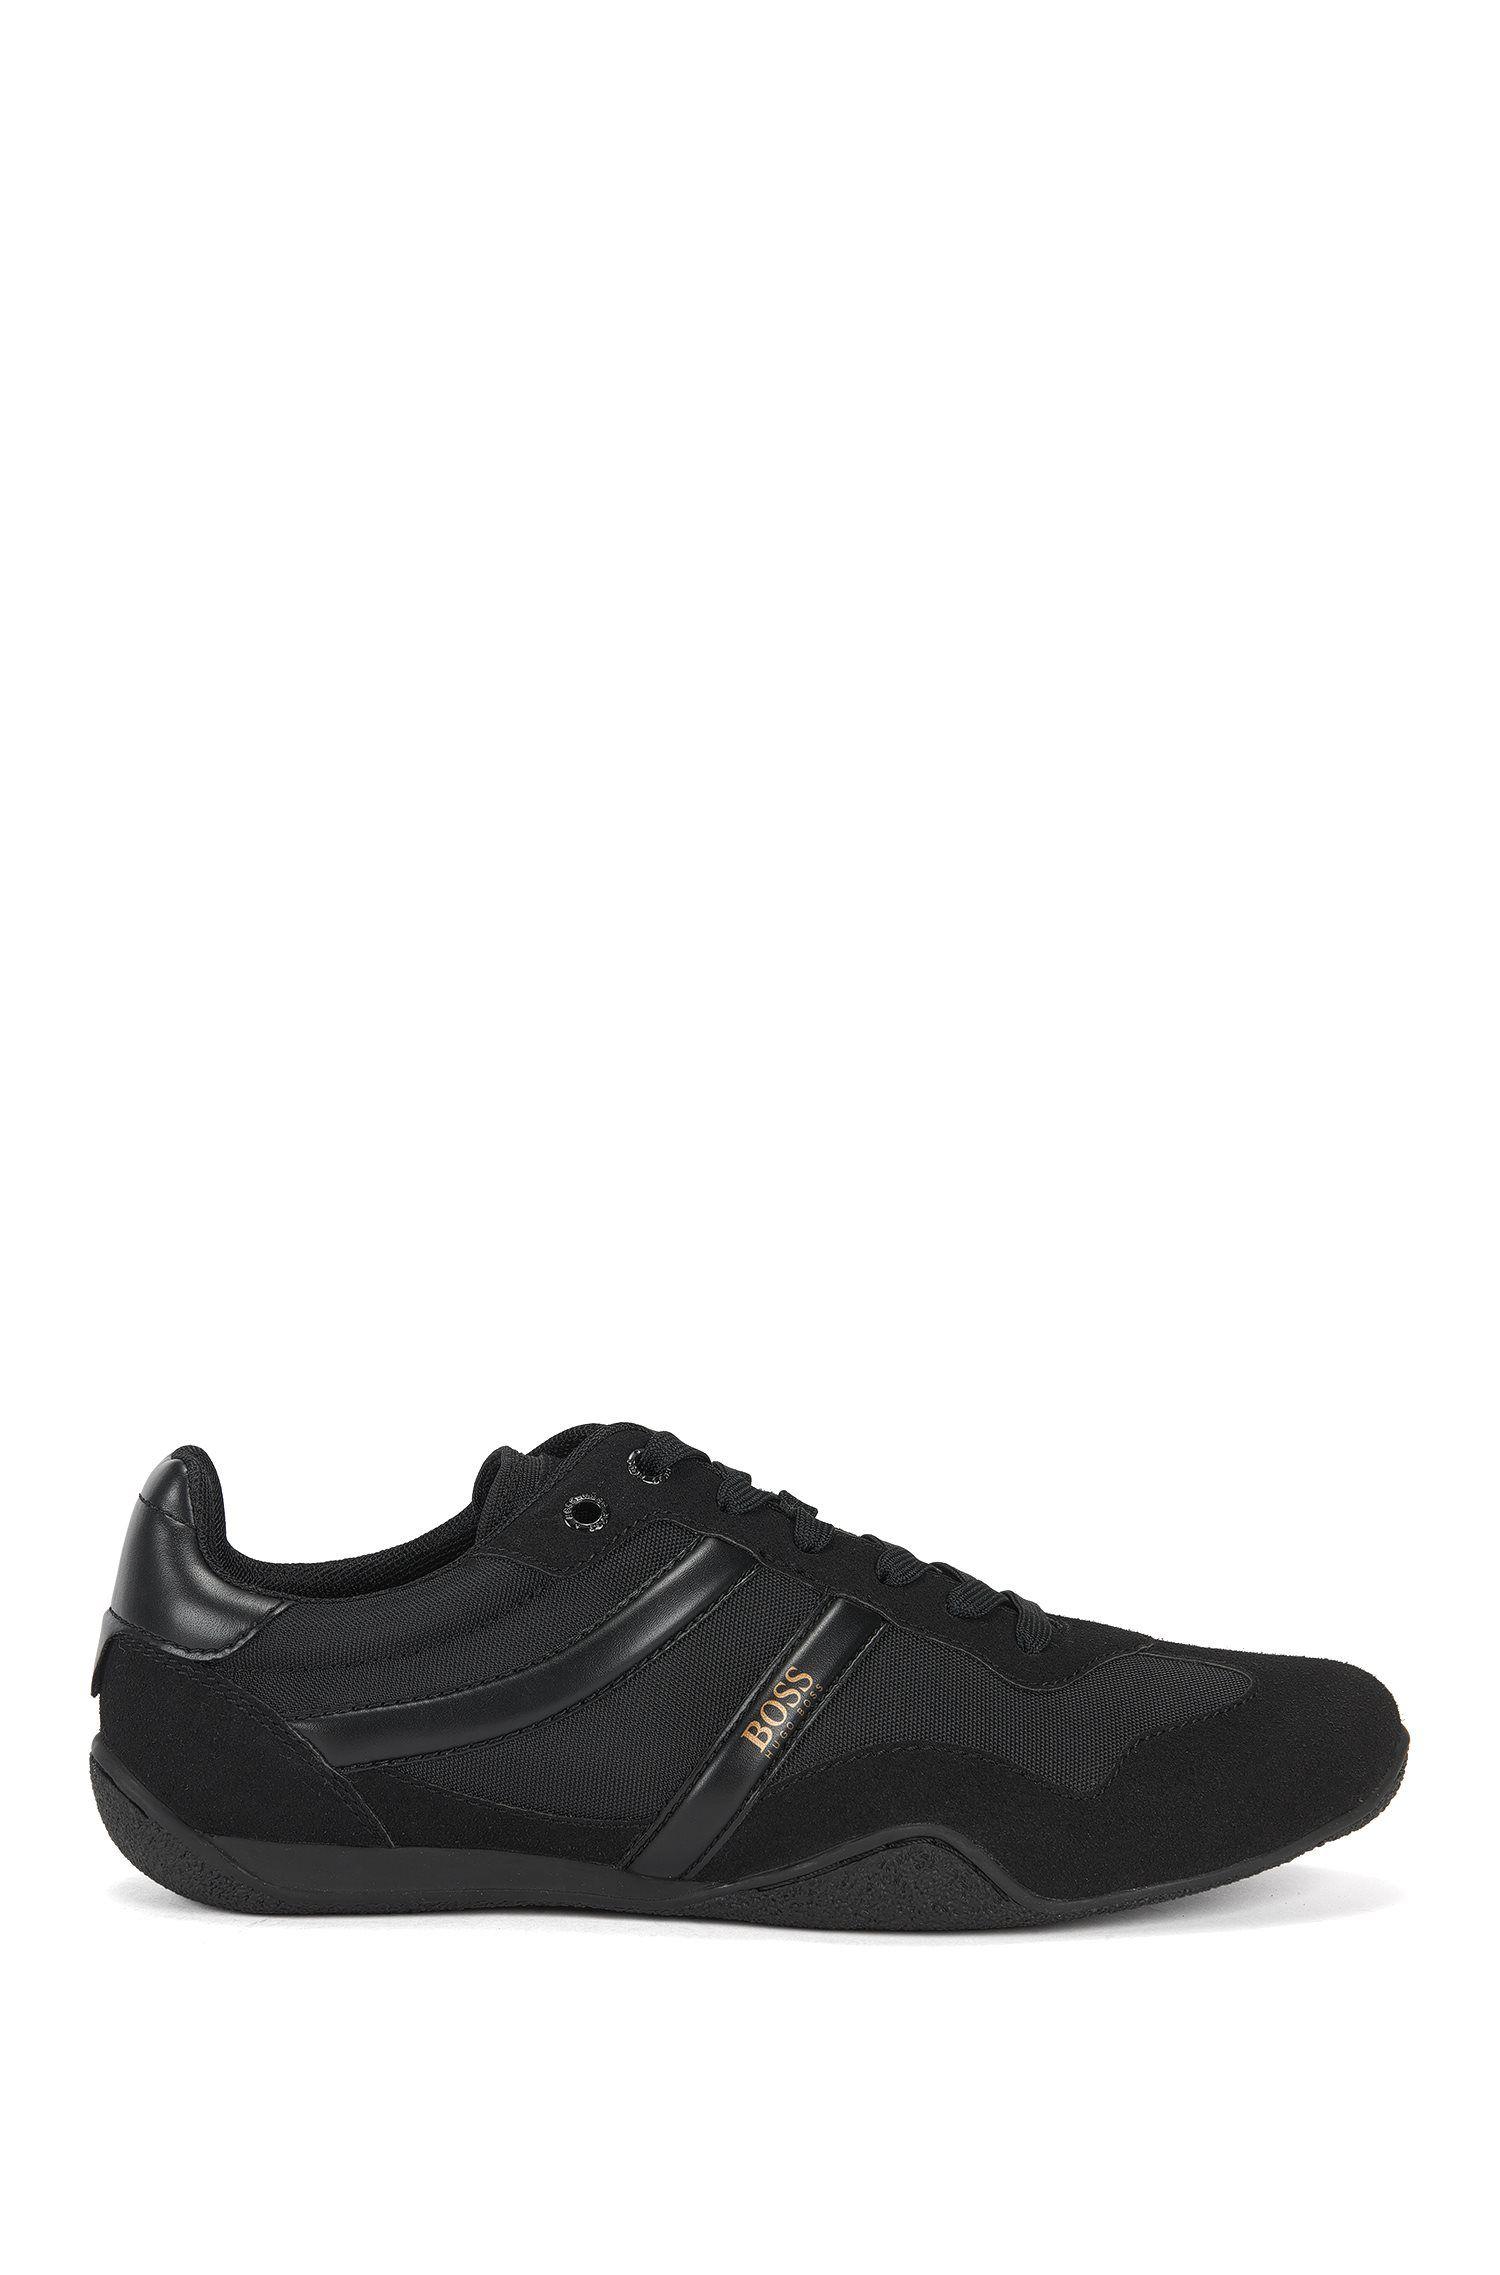 Sneakers low-top con leggera intersuola EVA